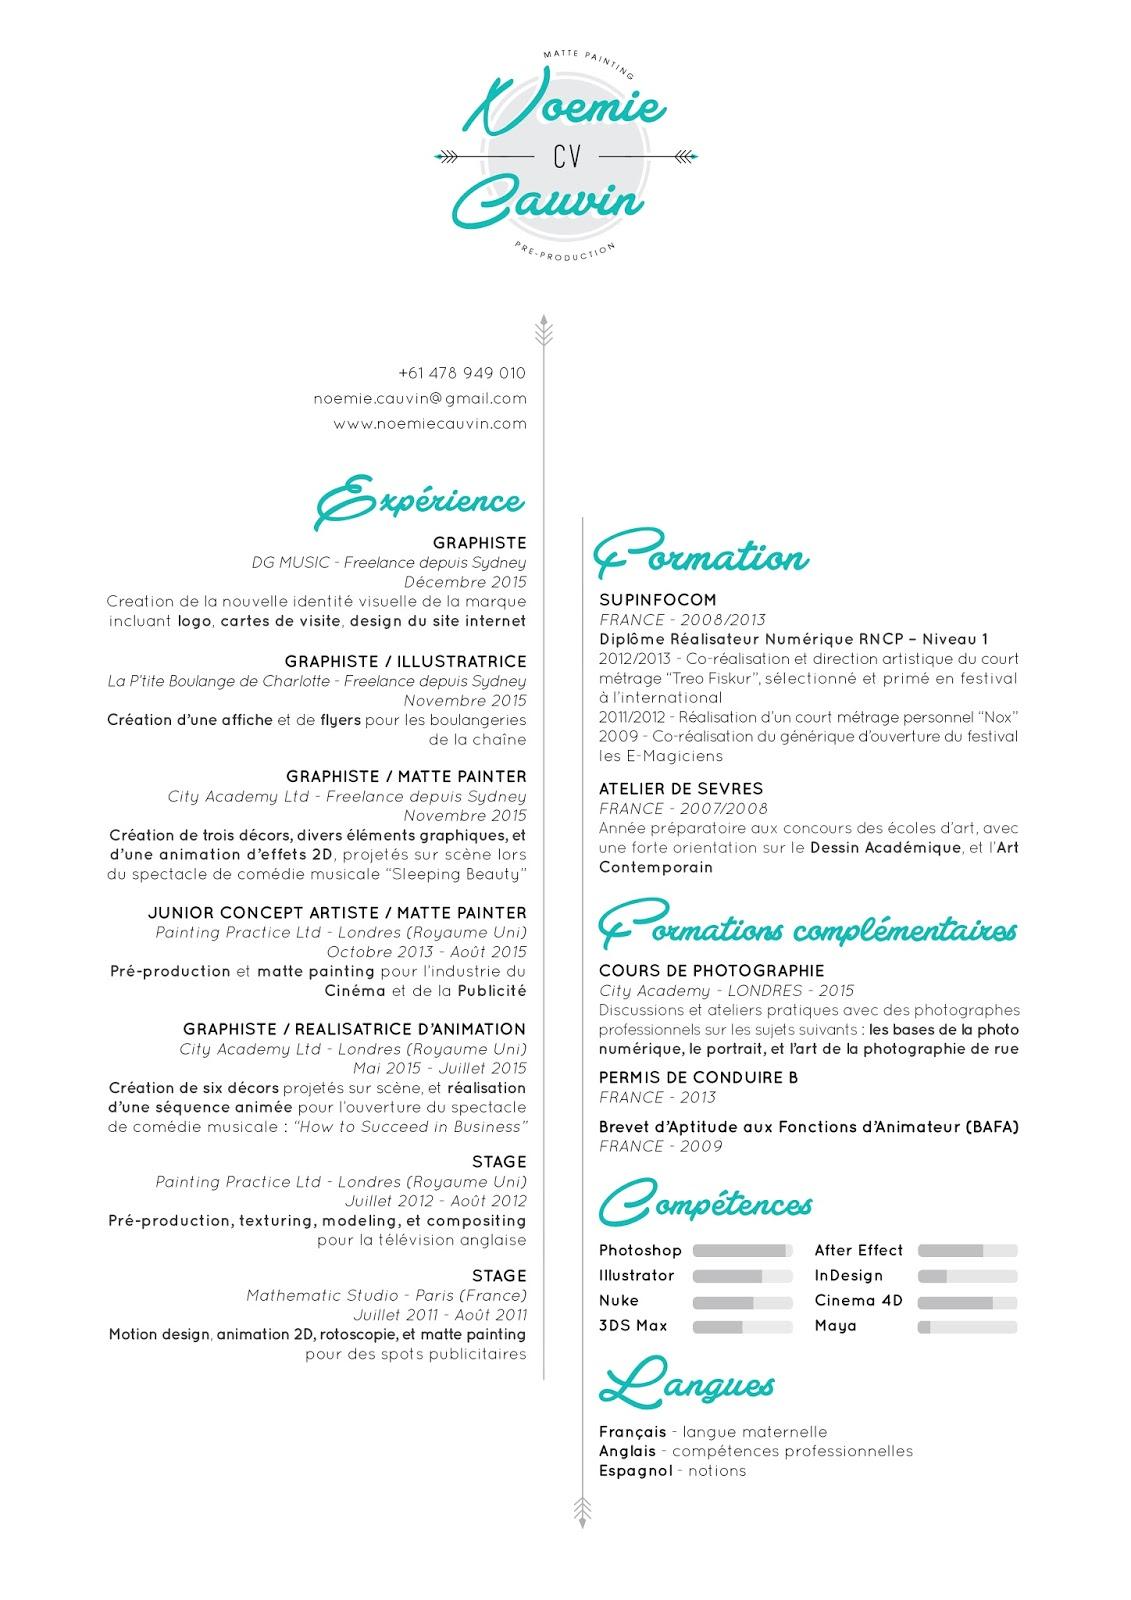 Préférence resume francais - Gse.bookbinder.co LV49